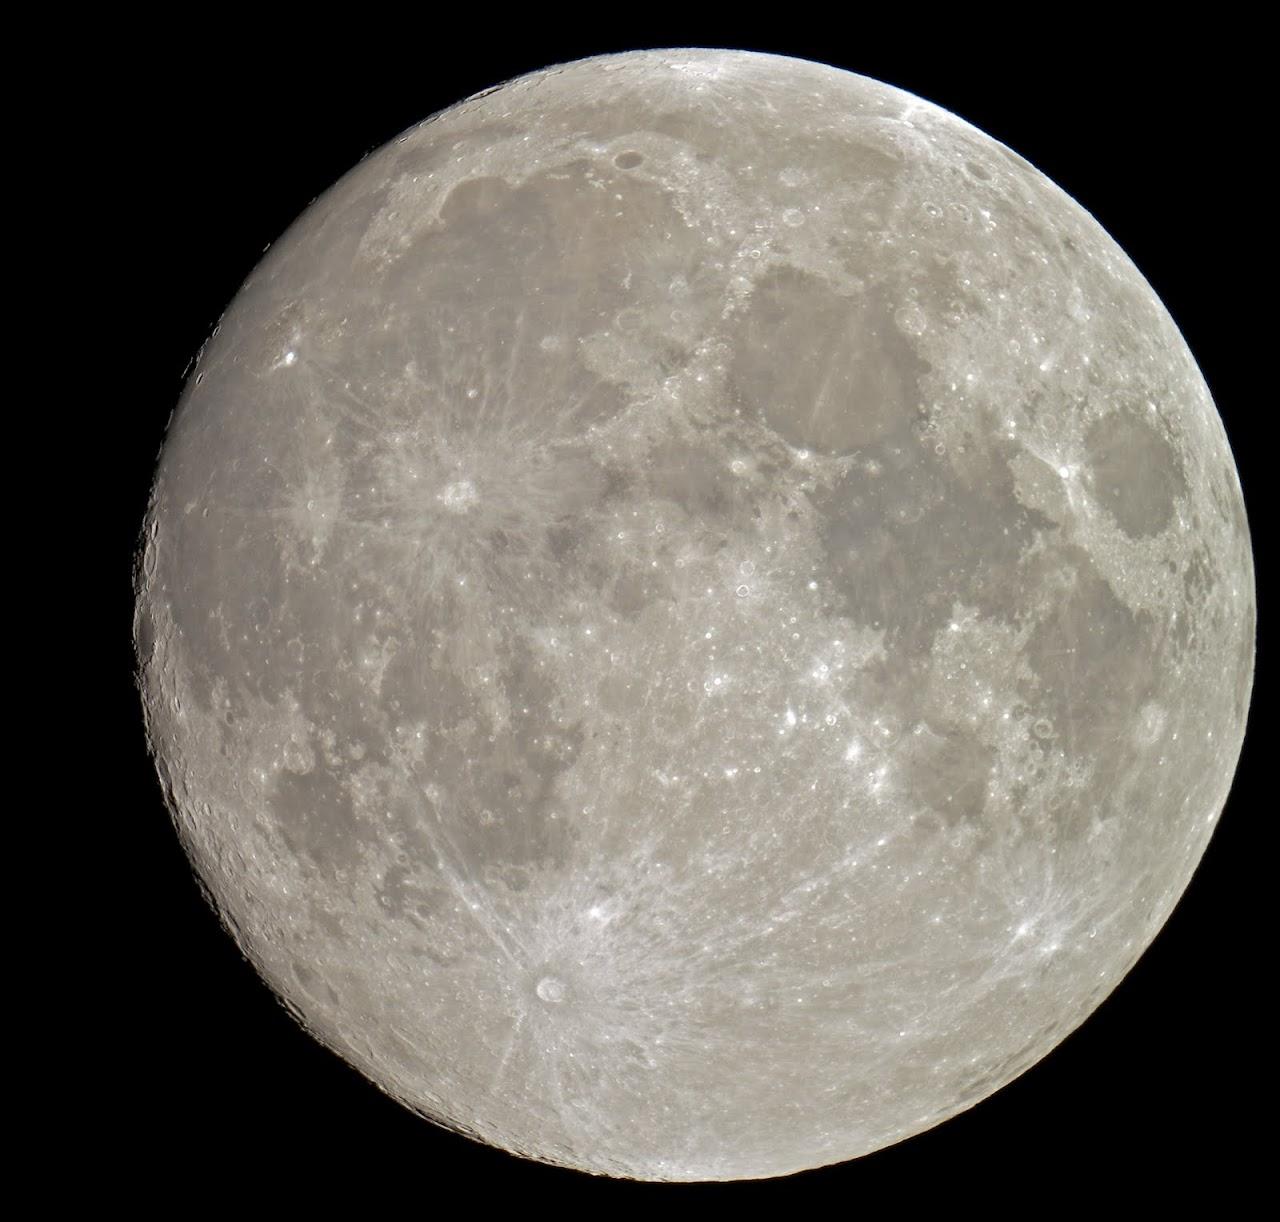 IMAGE: https://lh3.googleusercontent.com/-auQrdXKtmZk/Th6Kf_nLf0I/AAAAAAAANCI/arj5r_spHa4/s1280-Ic42/Moon2%2525207-13-2011.jpg